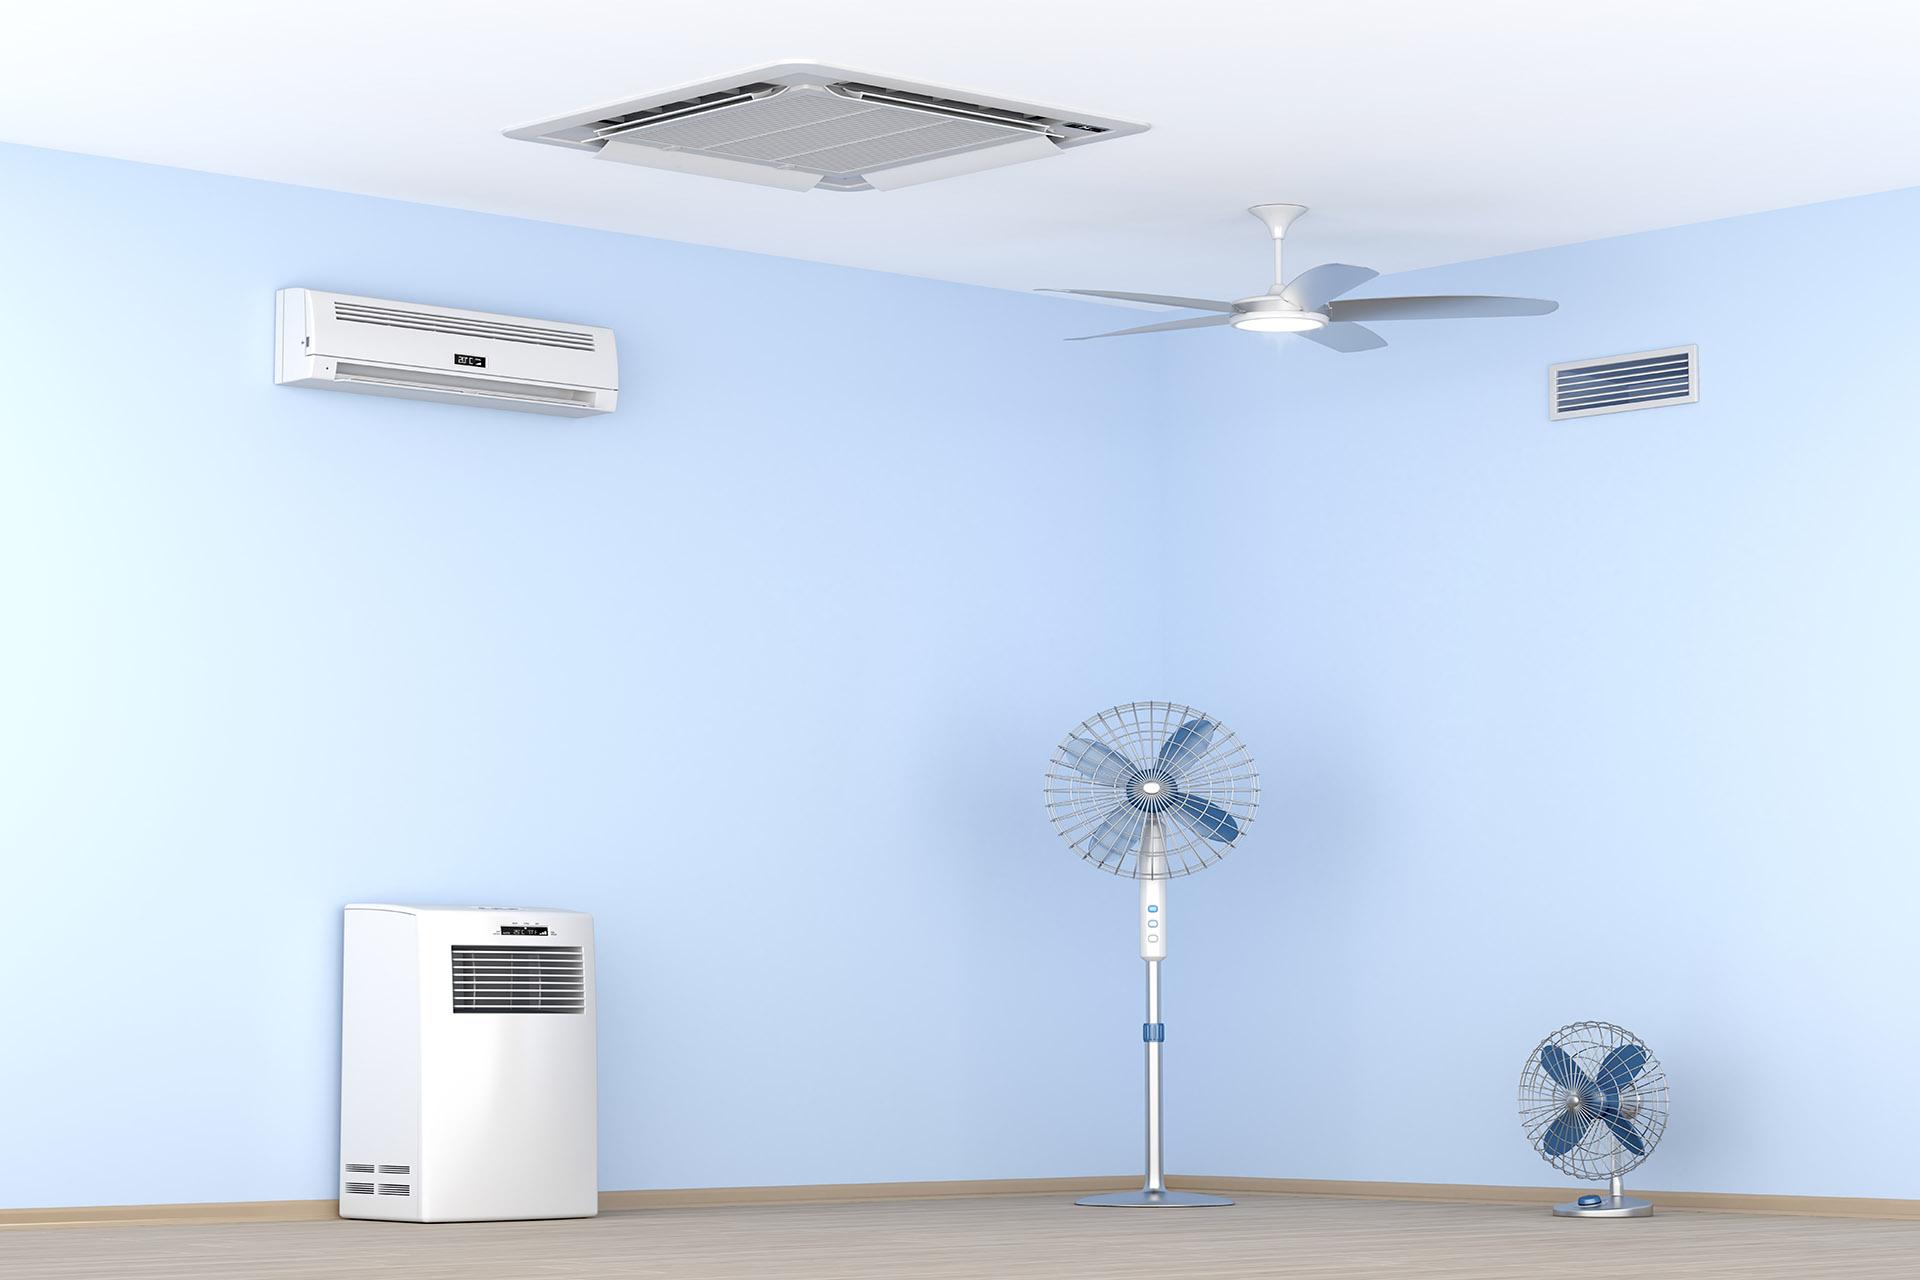 How do You Maintain an HVAC System?